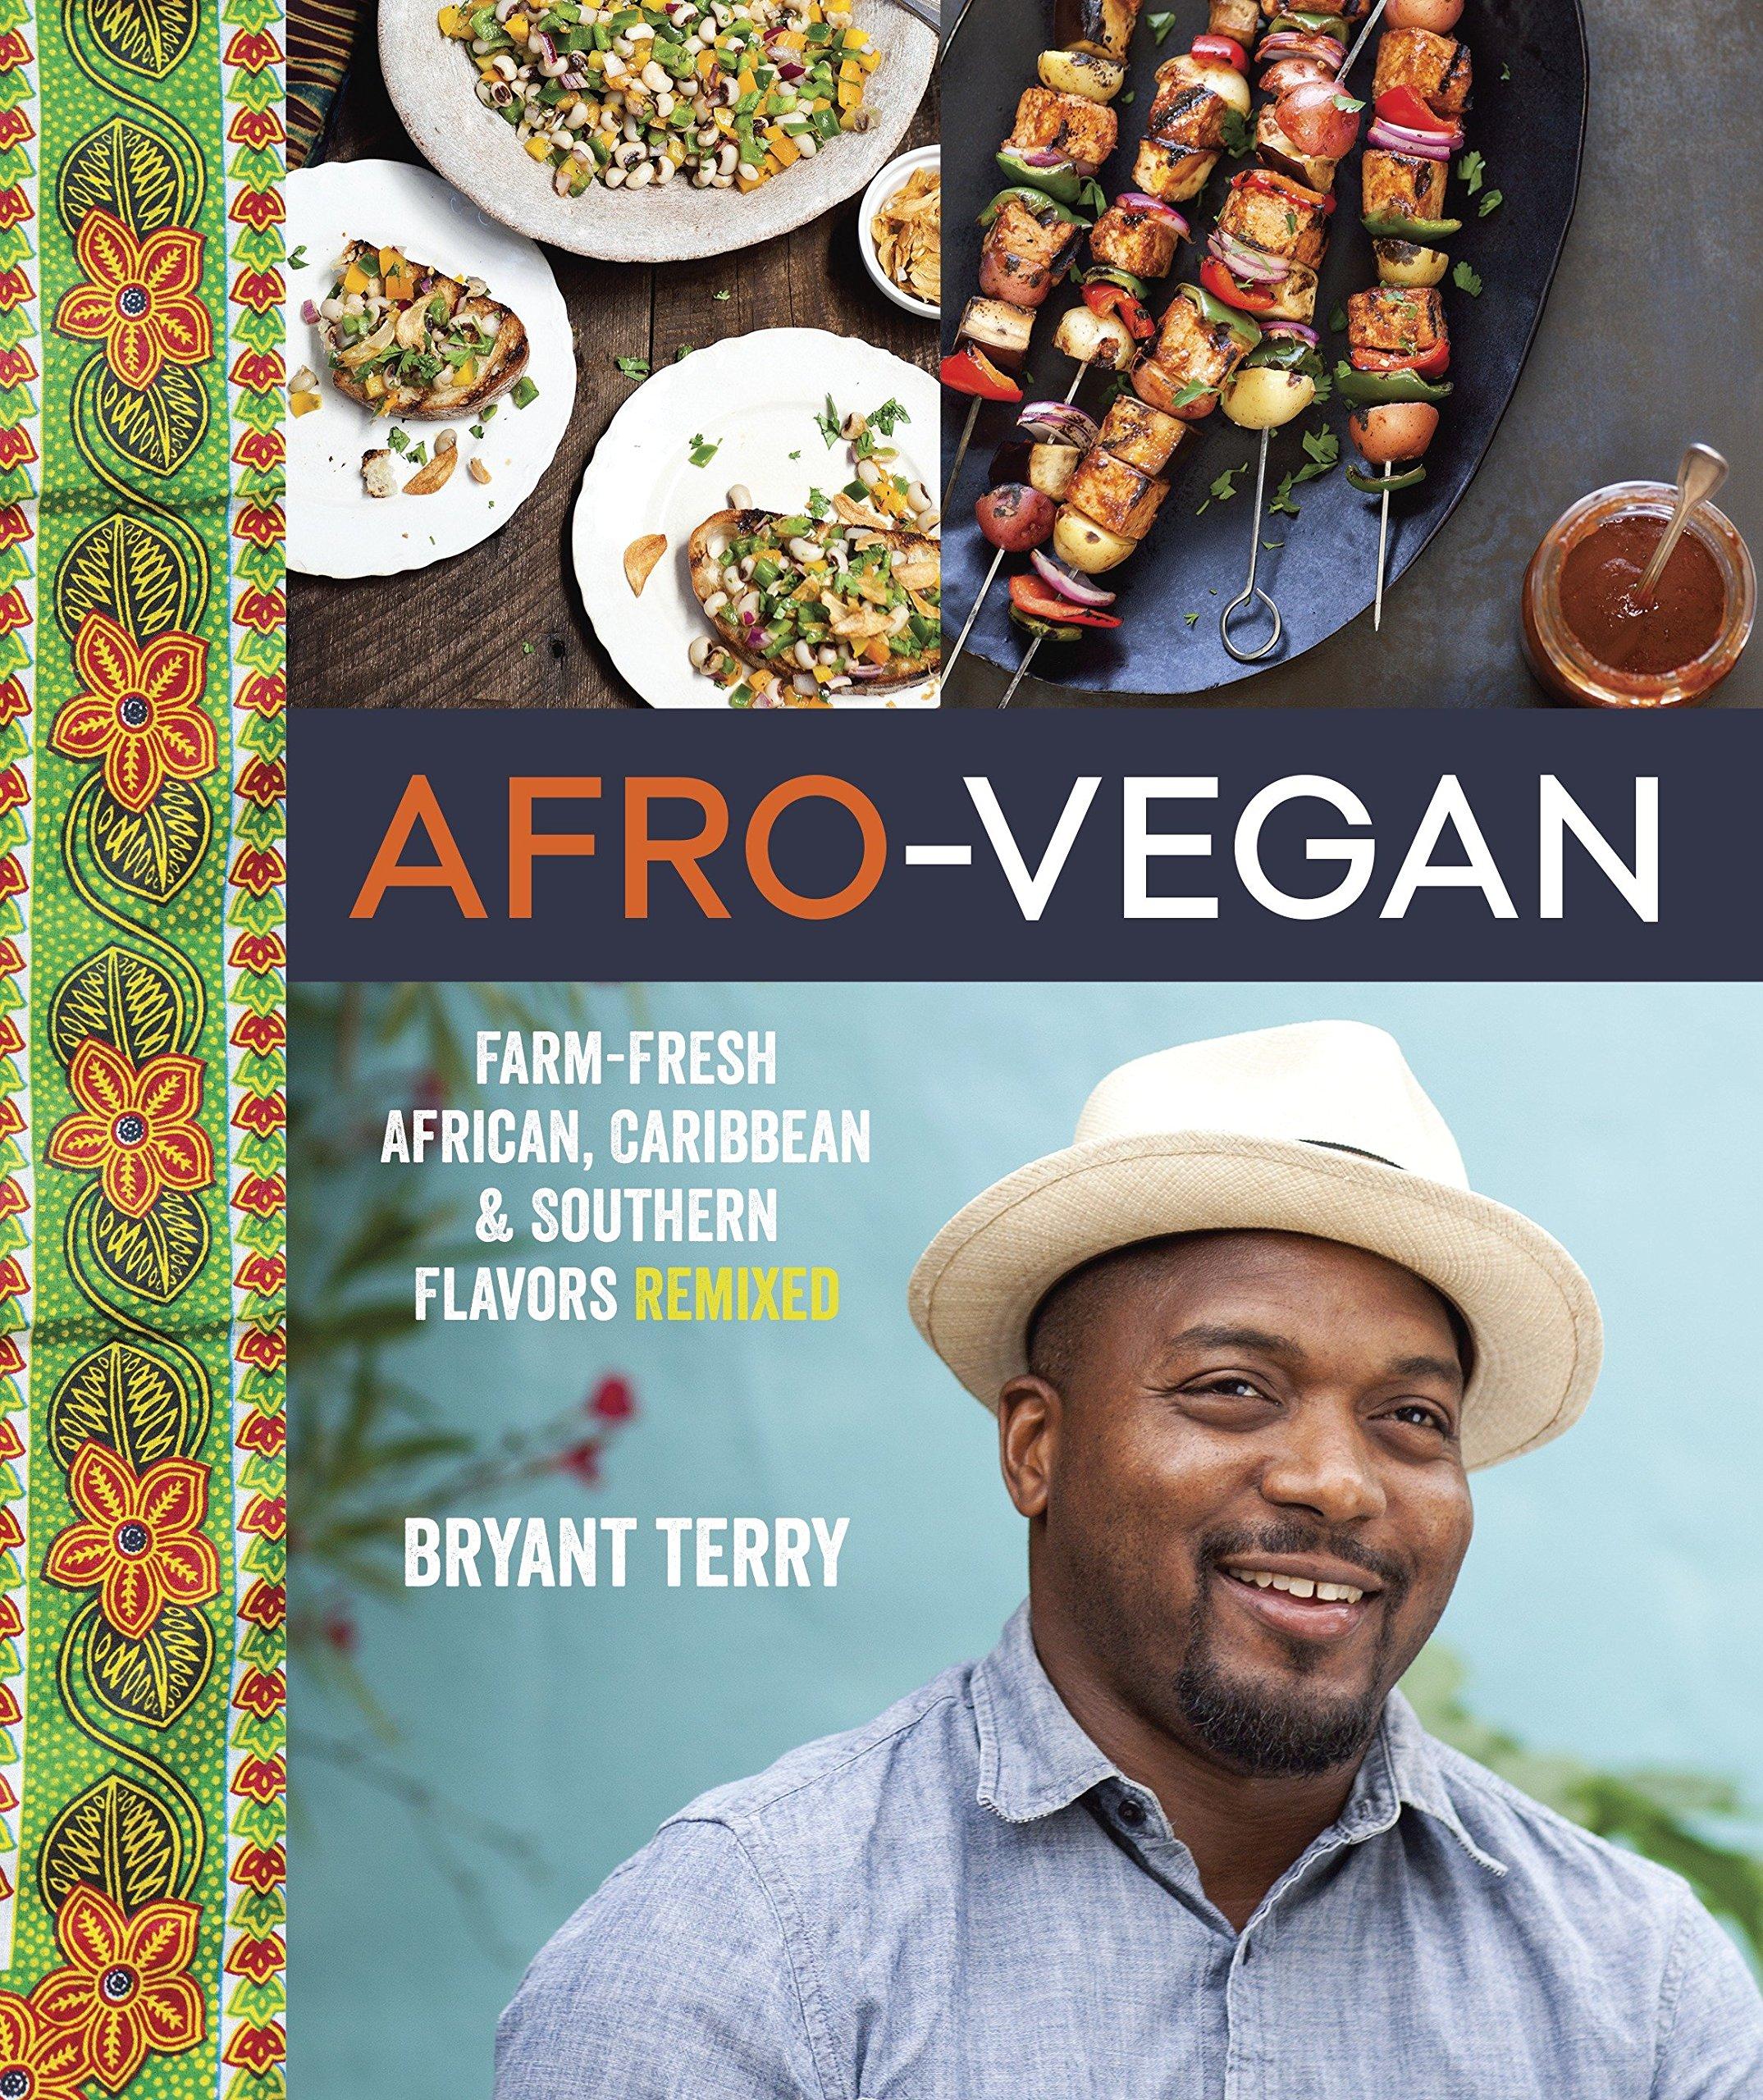 Afro Vegan Farm Fresh African Caribbean Southern